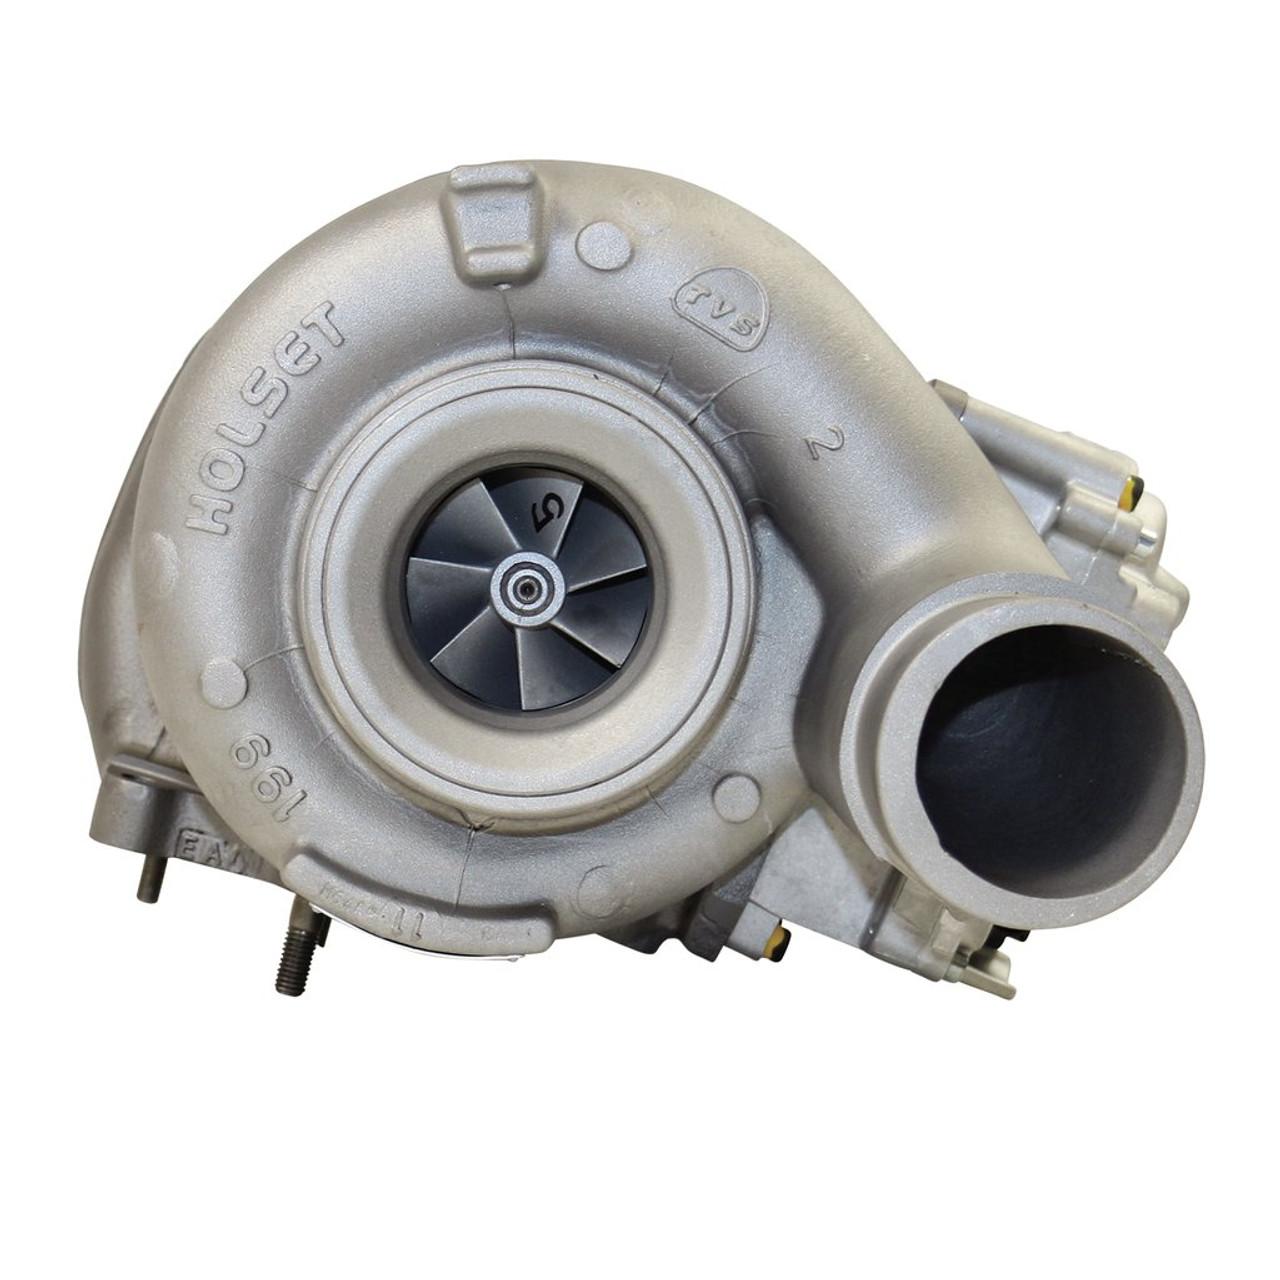 BD Rebuilt 6.7L Turbo